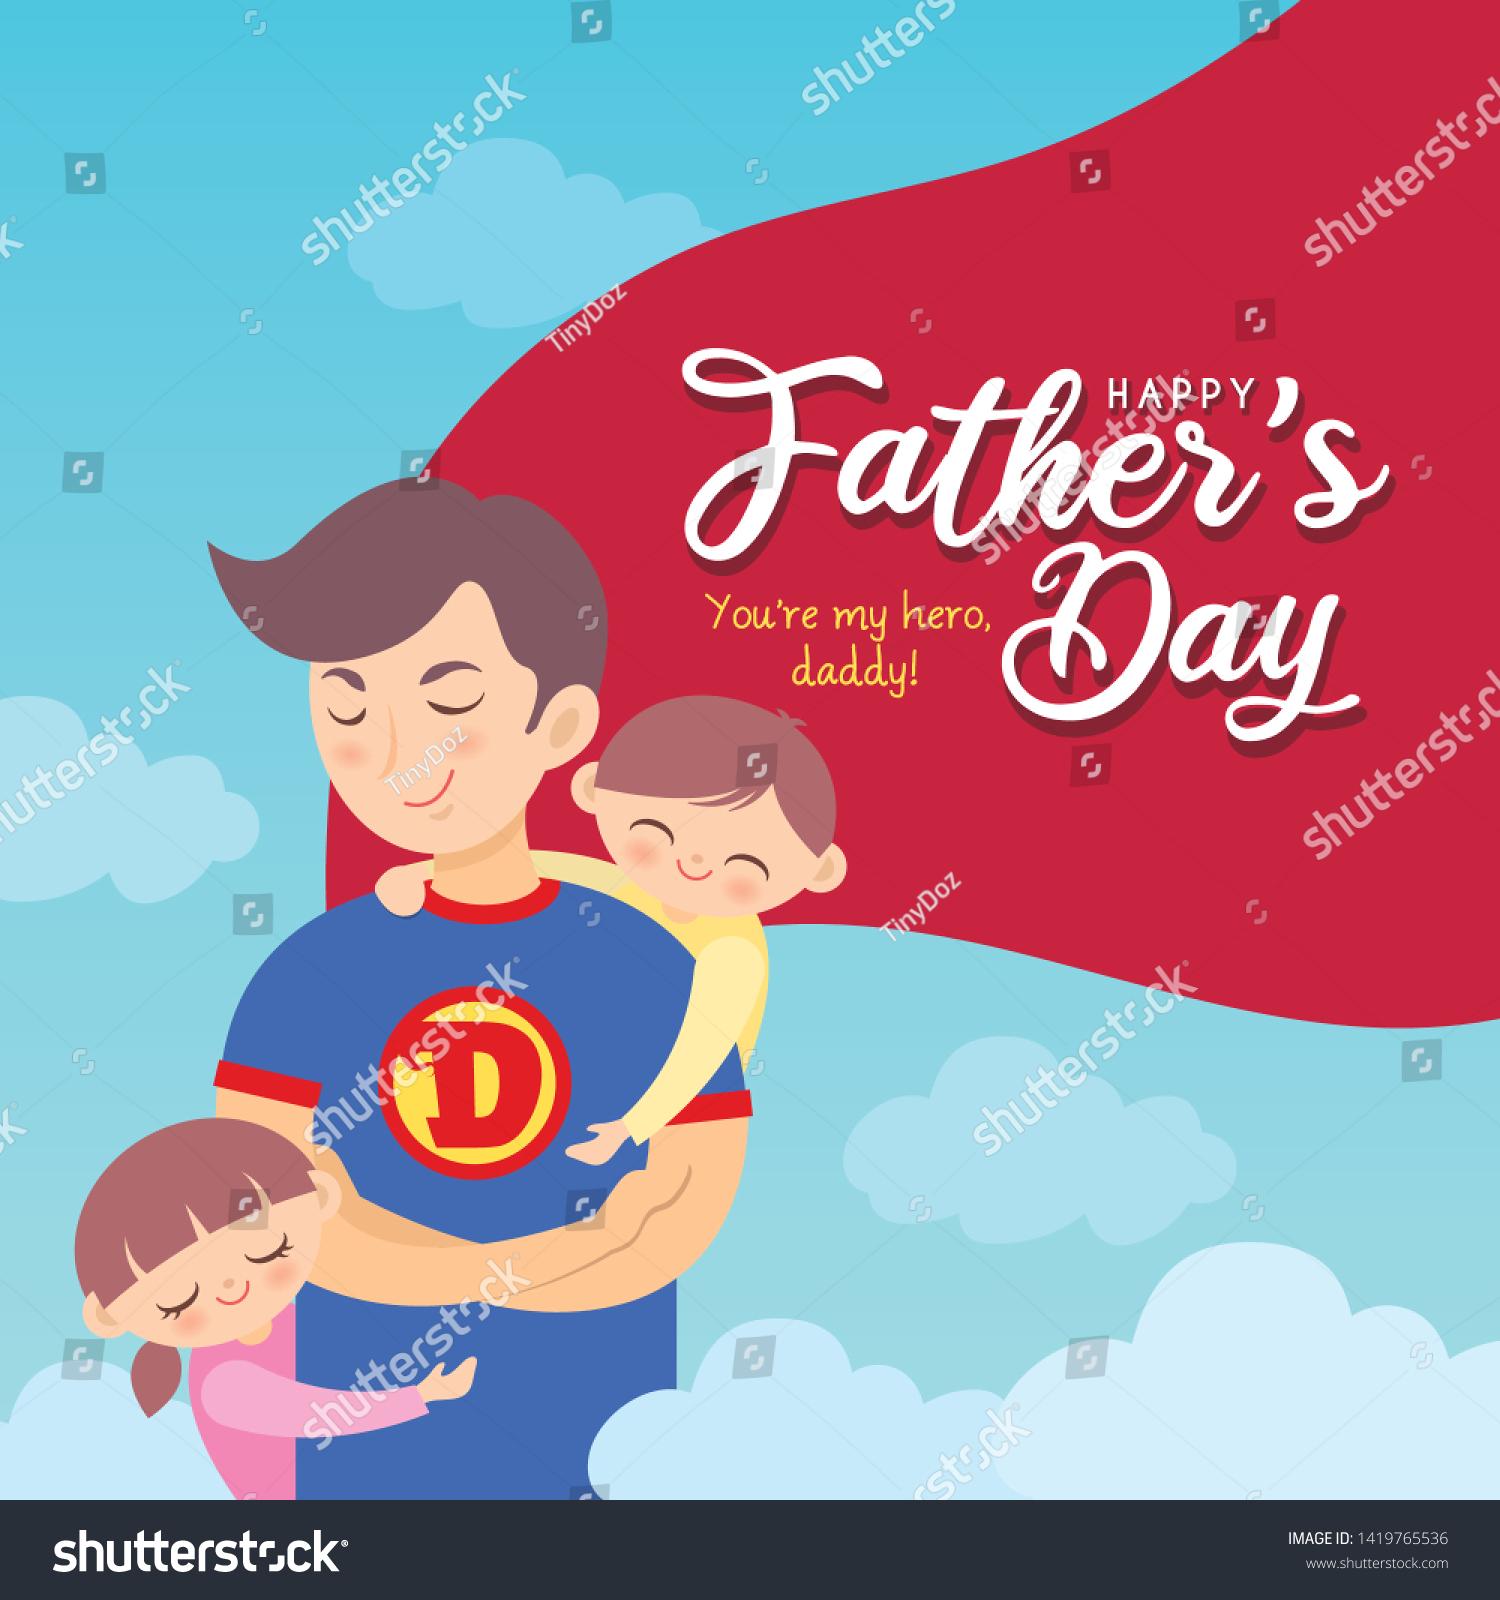 Superhero Fathers Day Card Birthday Card For Dad Daddy Super Dad